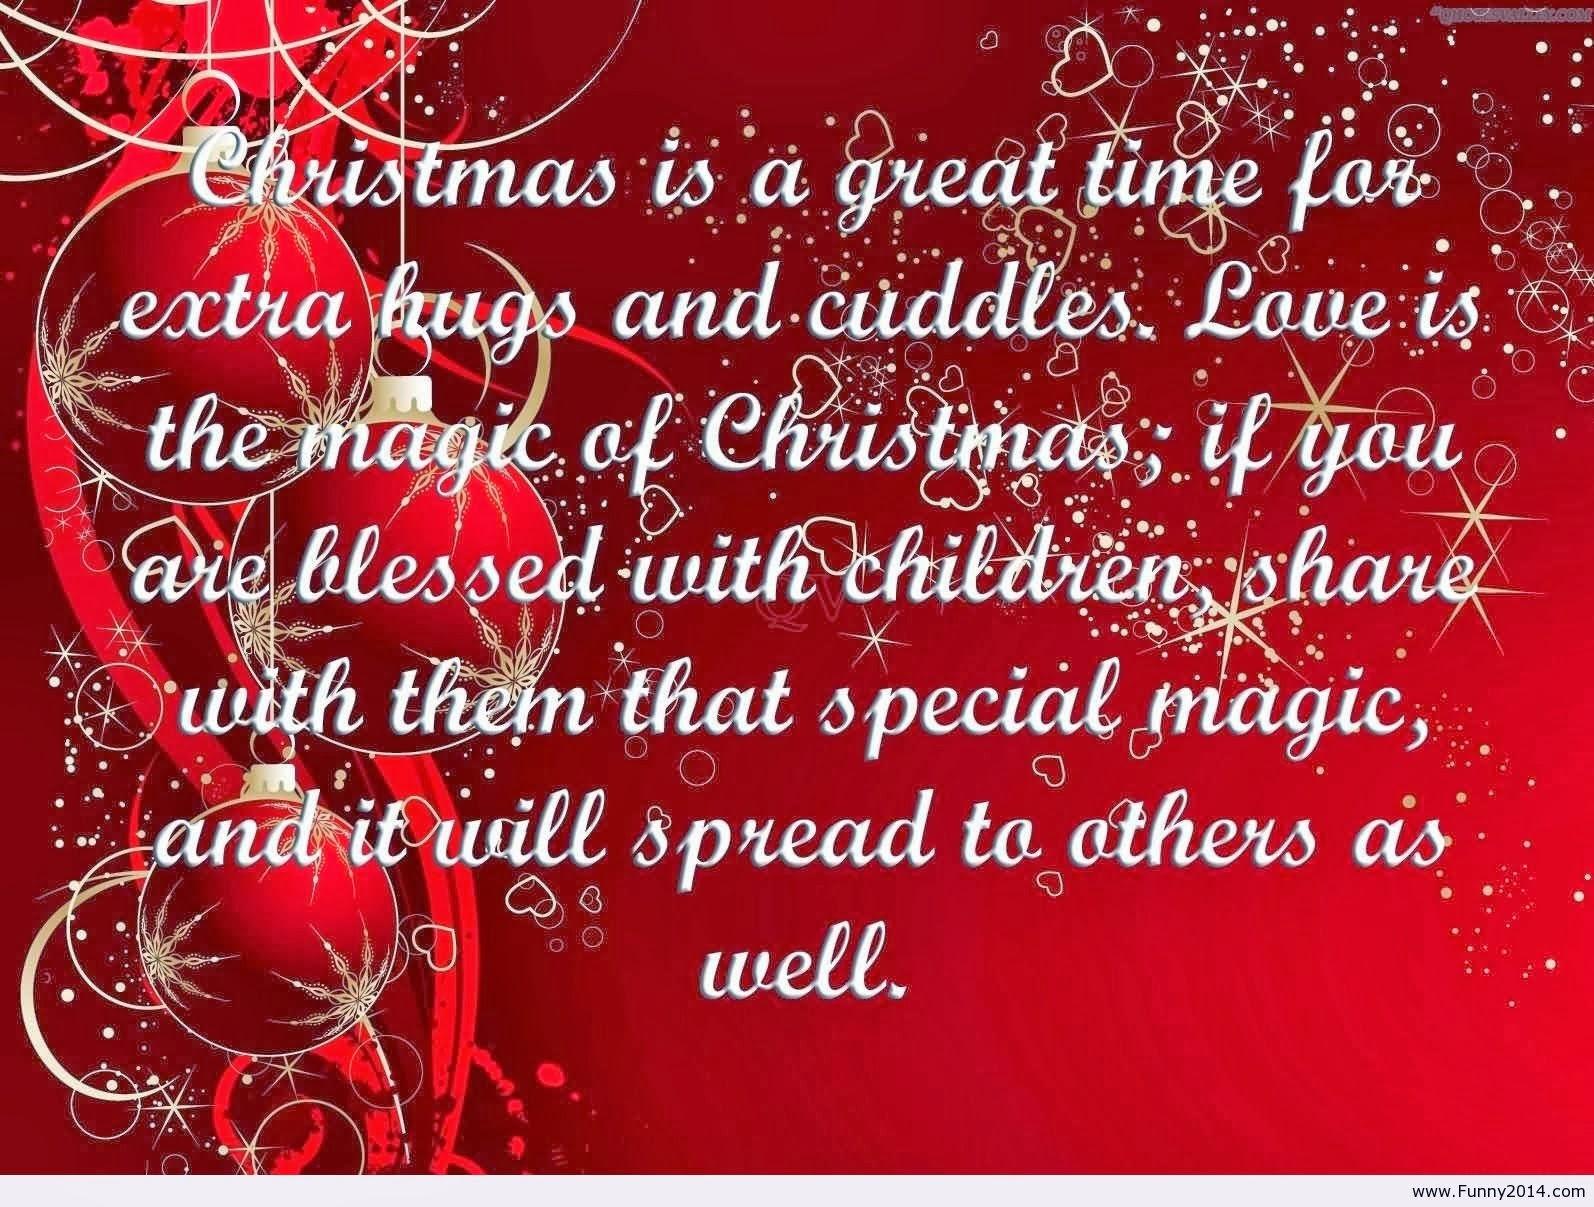 Funny-love-sad-birthday Sms: Merry Christmas Wallpaper 2013